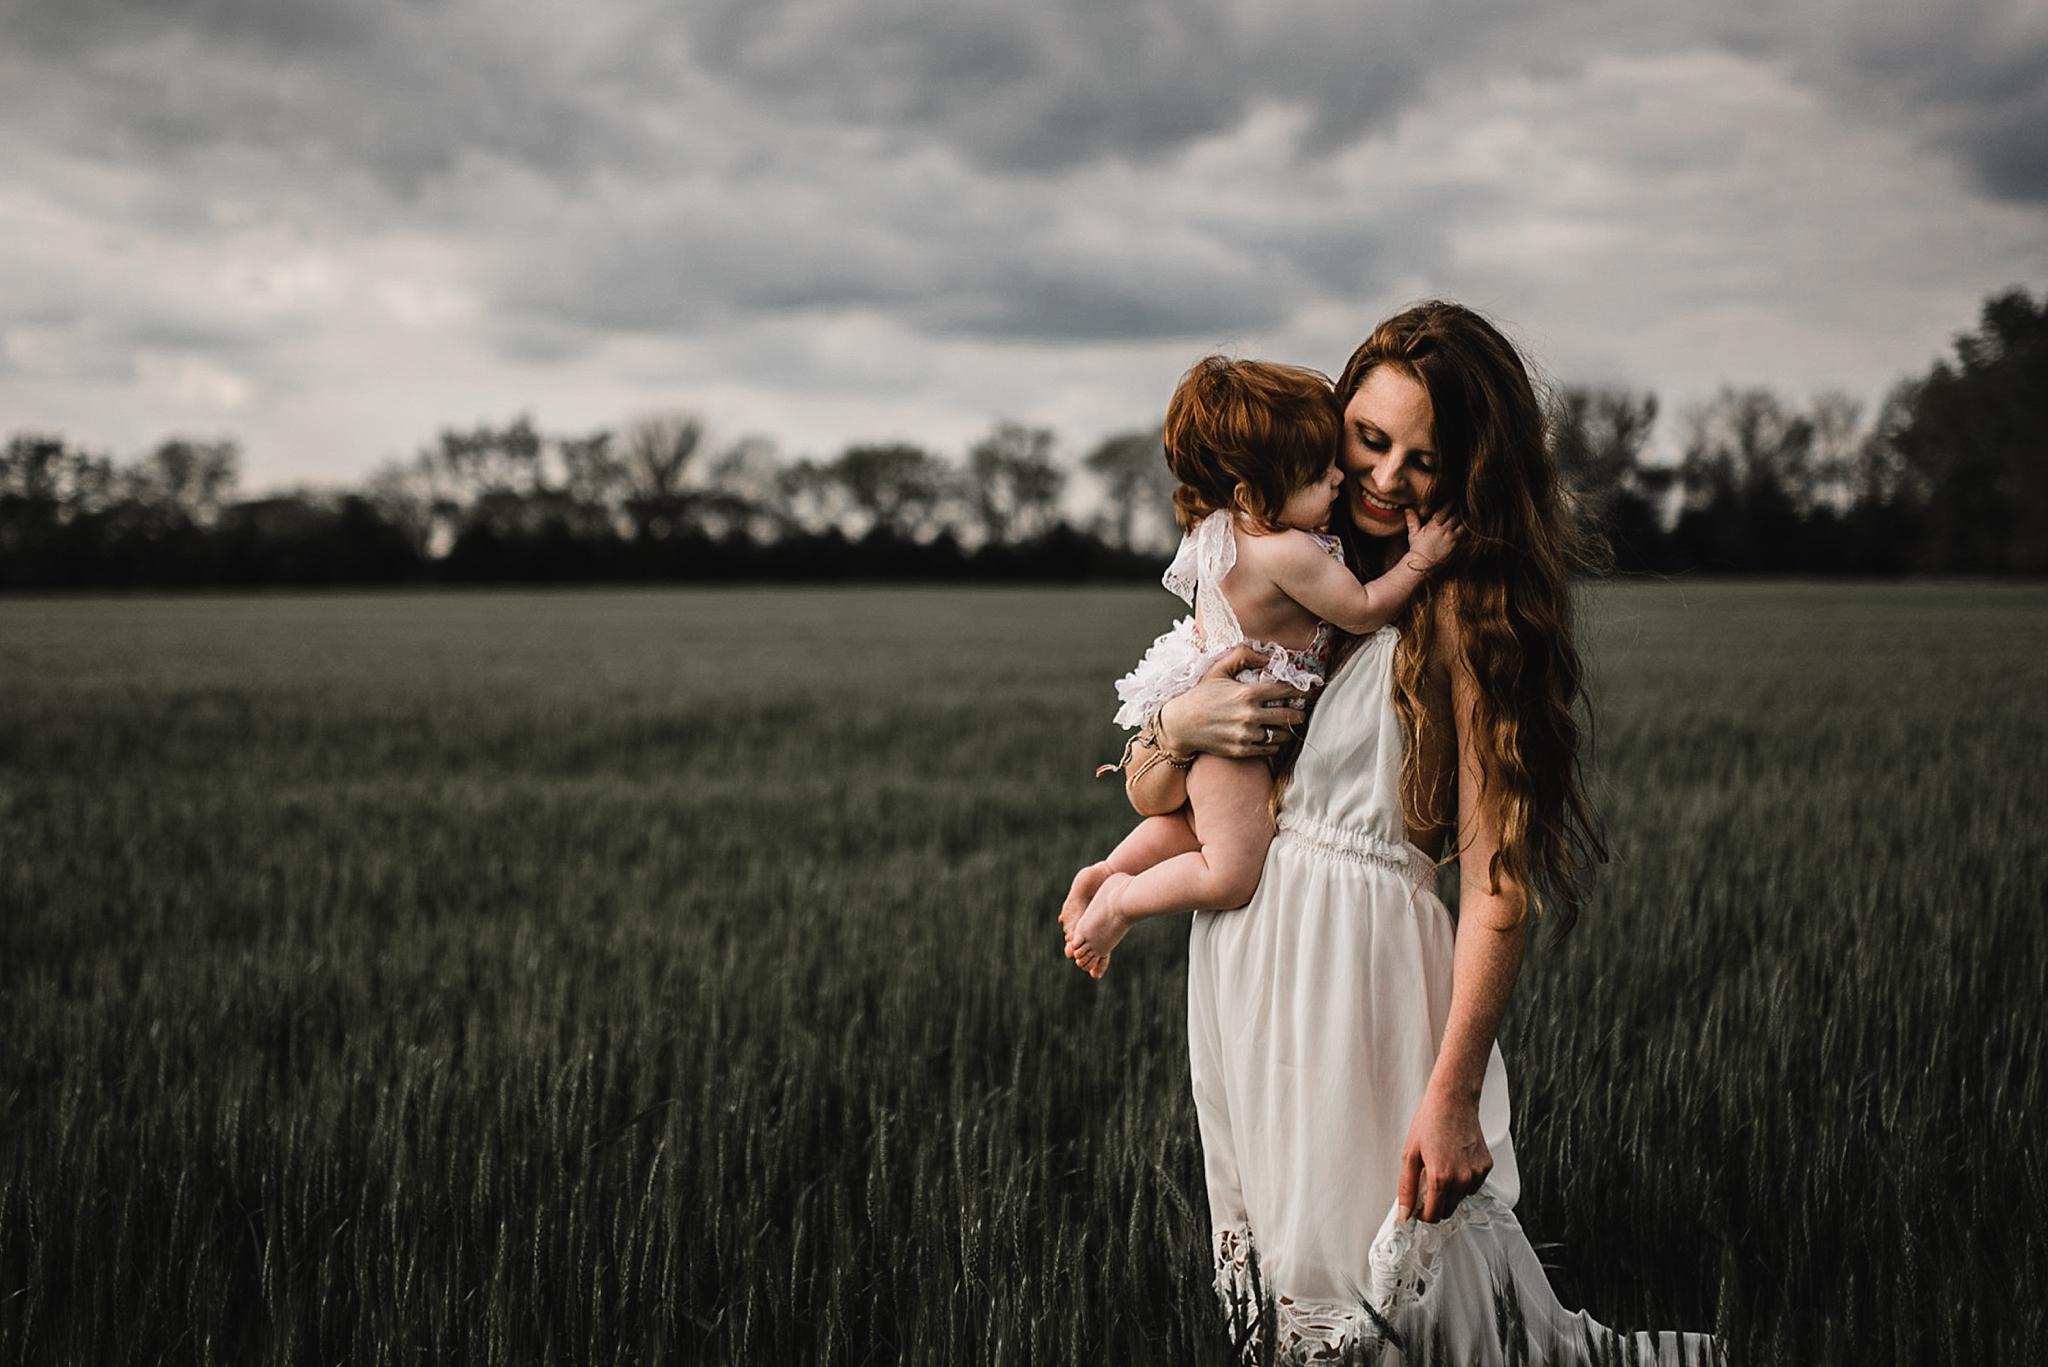 twyla jones photography - mother daughter - field and forest-4374_treasure coast florida.jpg